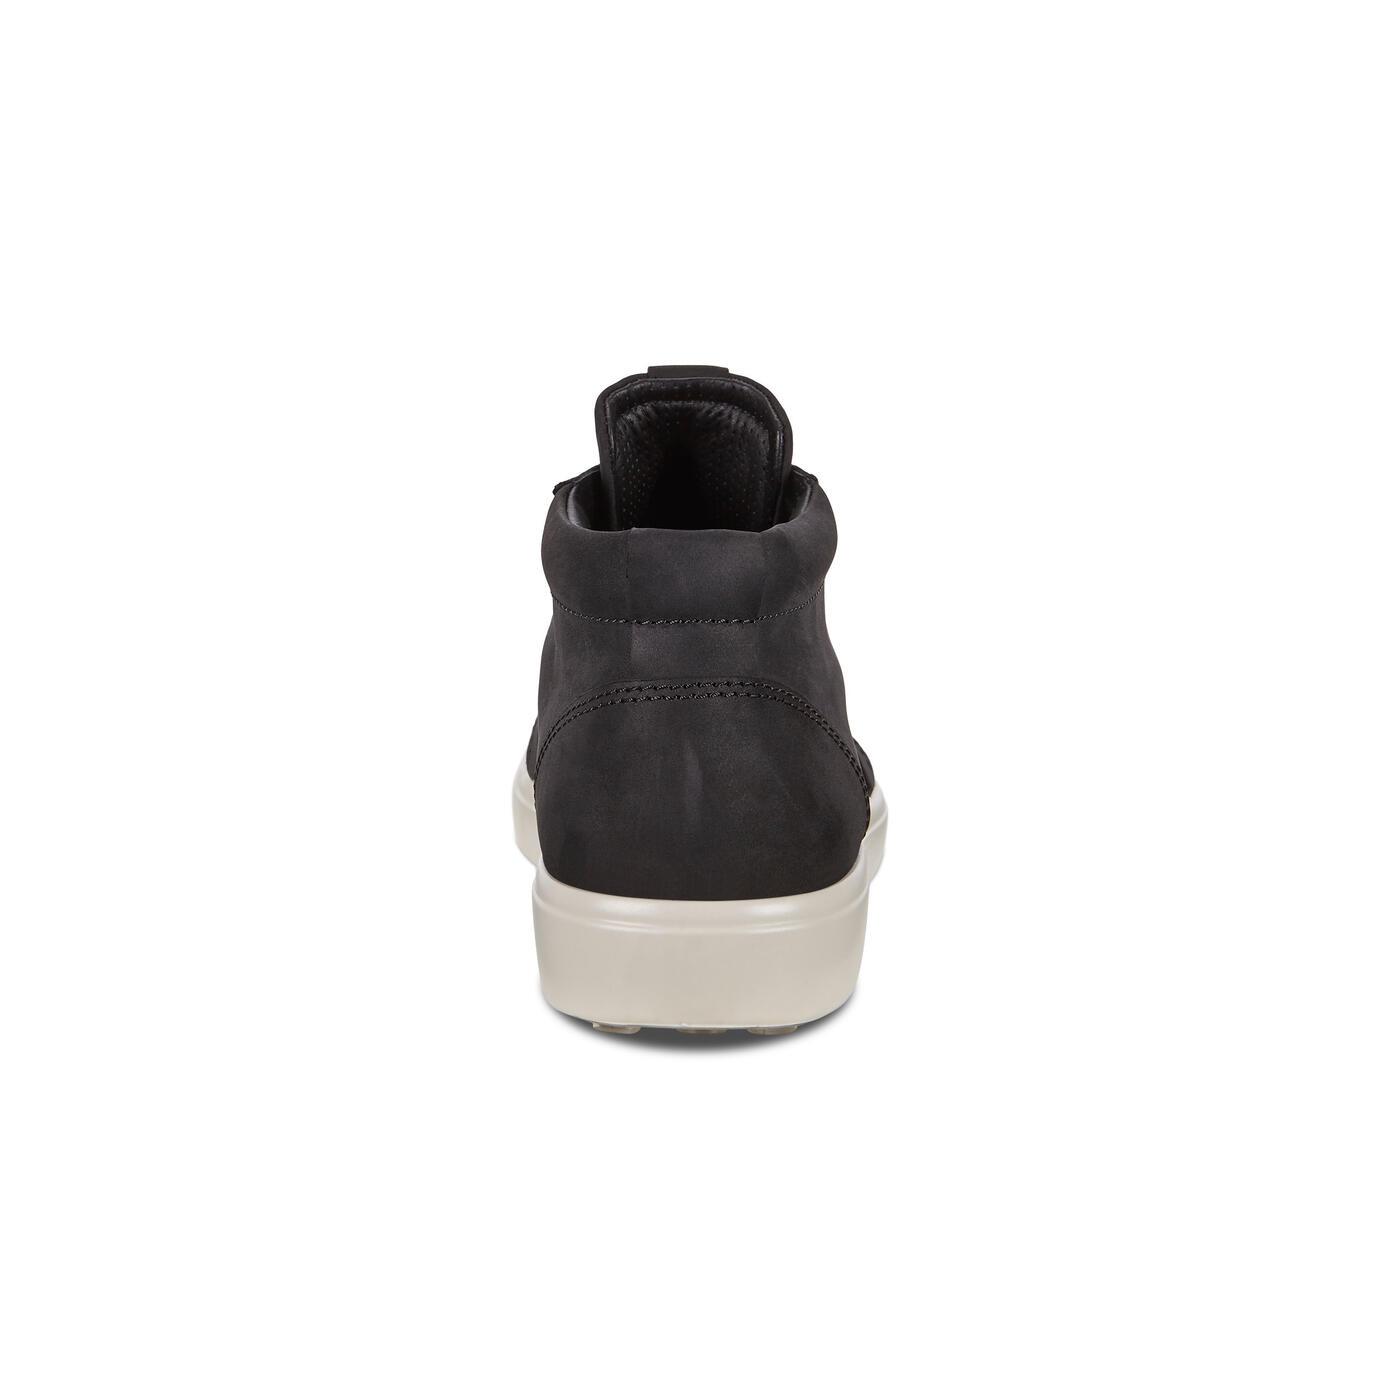 ECCO Soft 7 M Chukka Boot